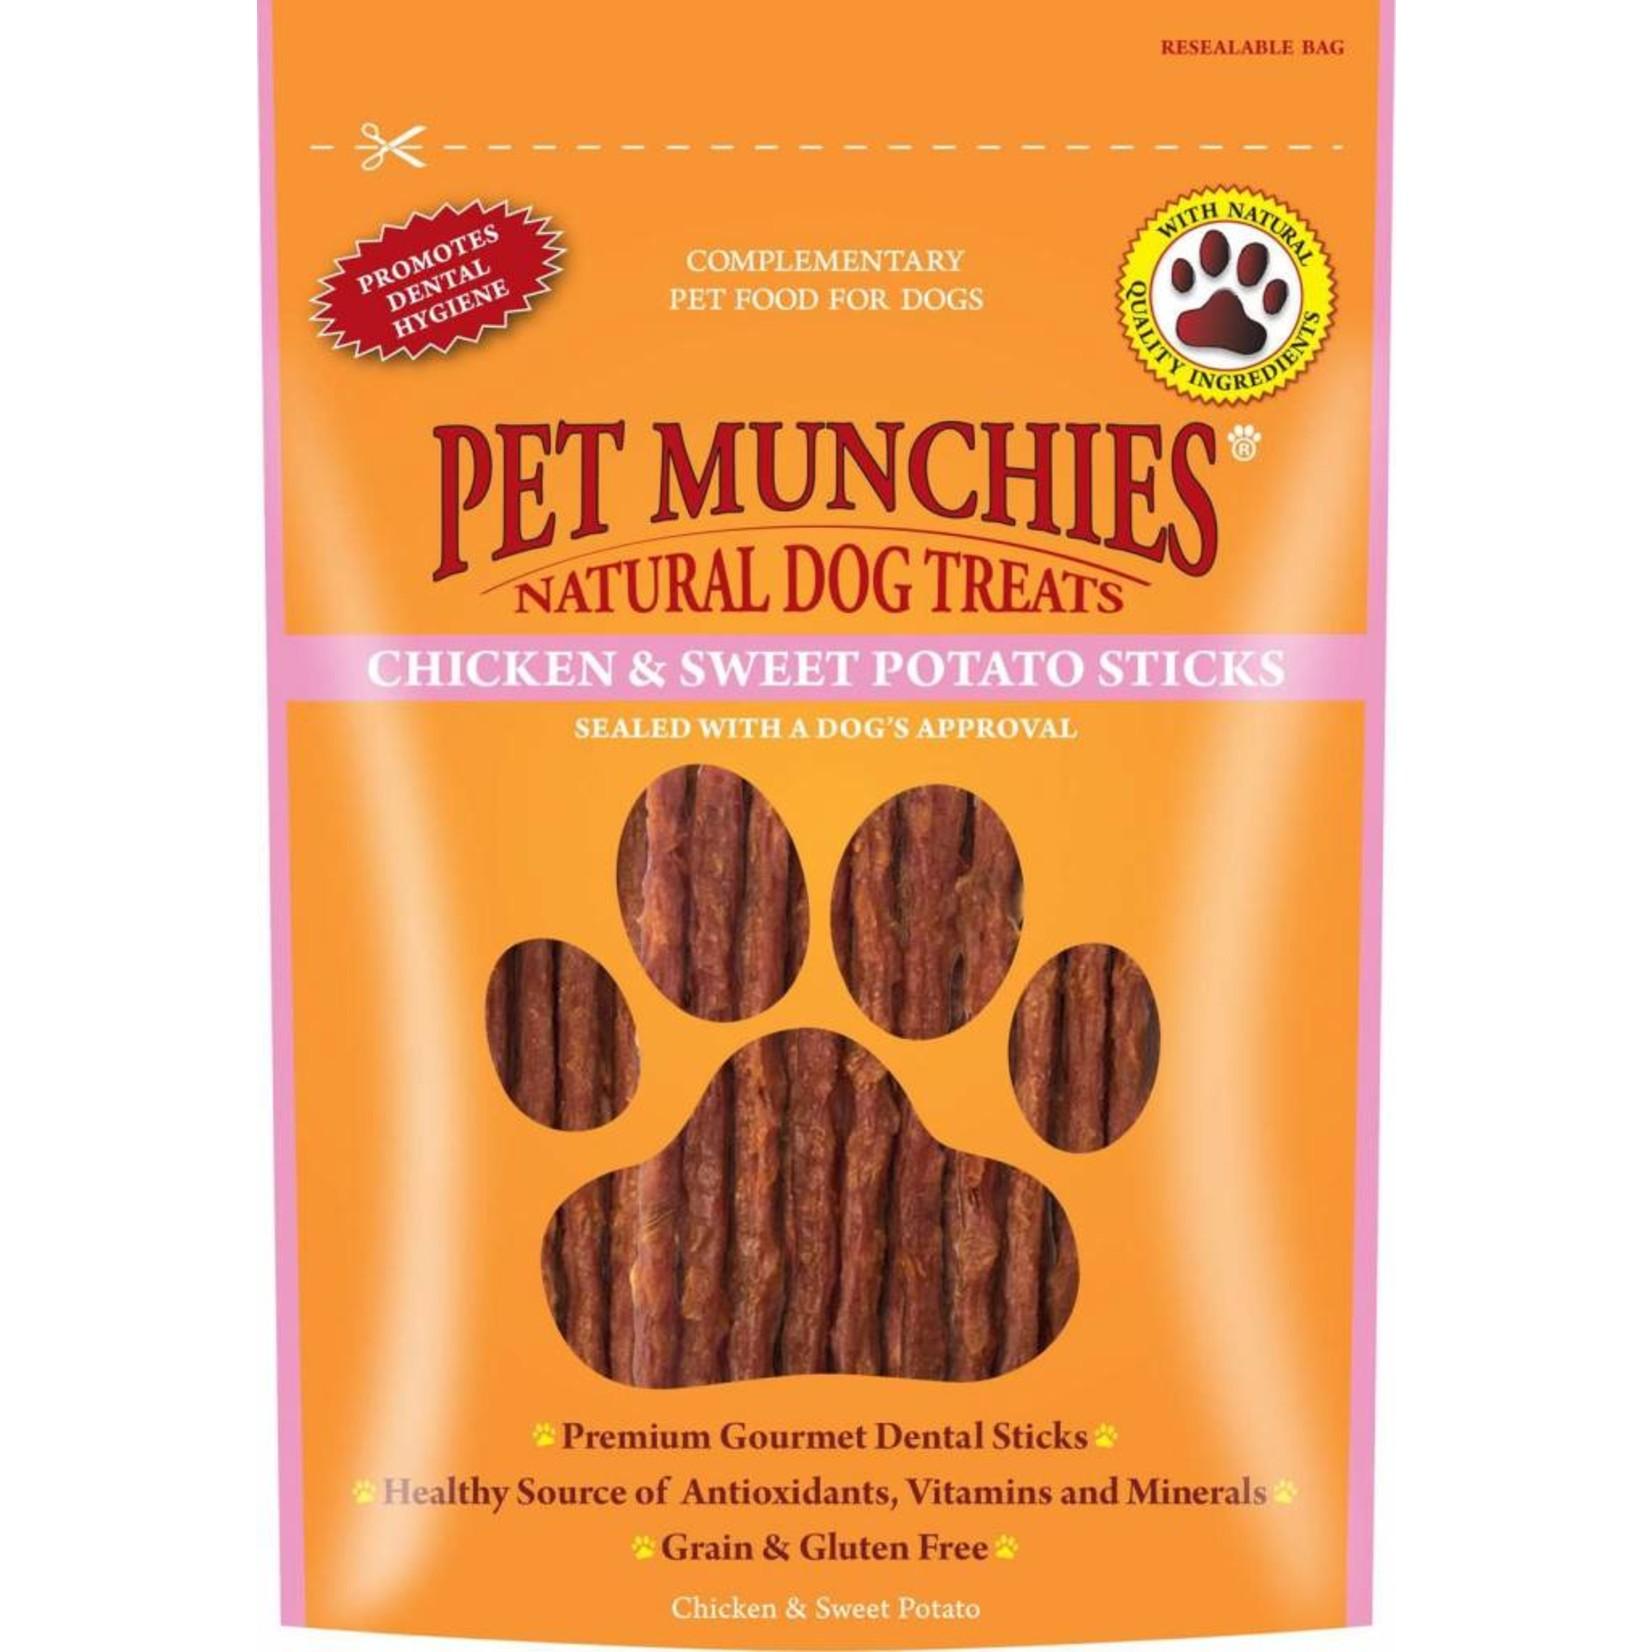 Pet Munchies Chicken & Sweet Potato Sticks Natural Dog Treats, 90g